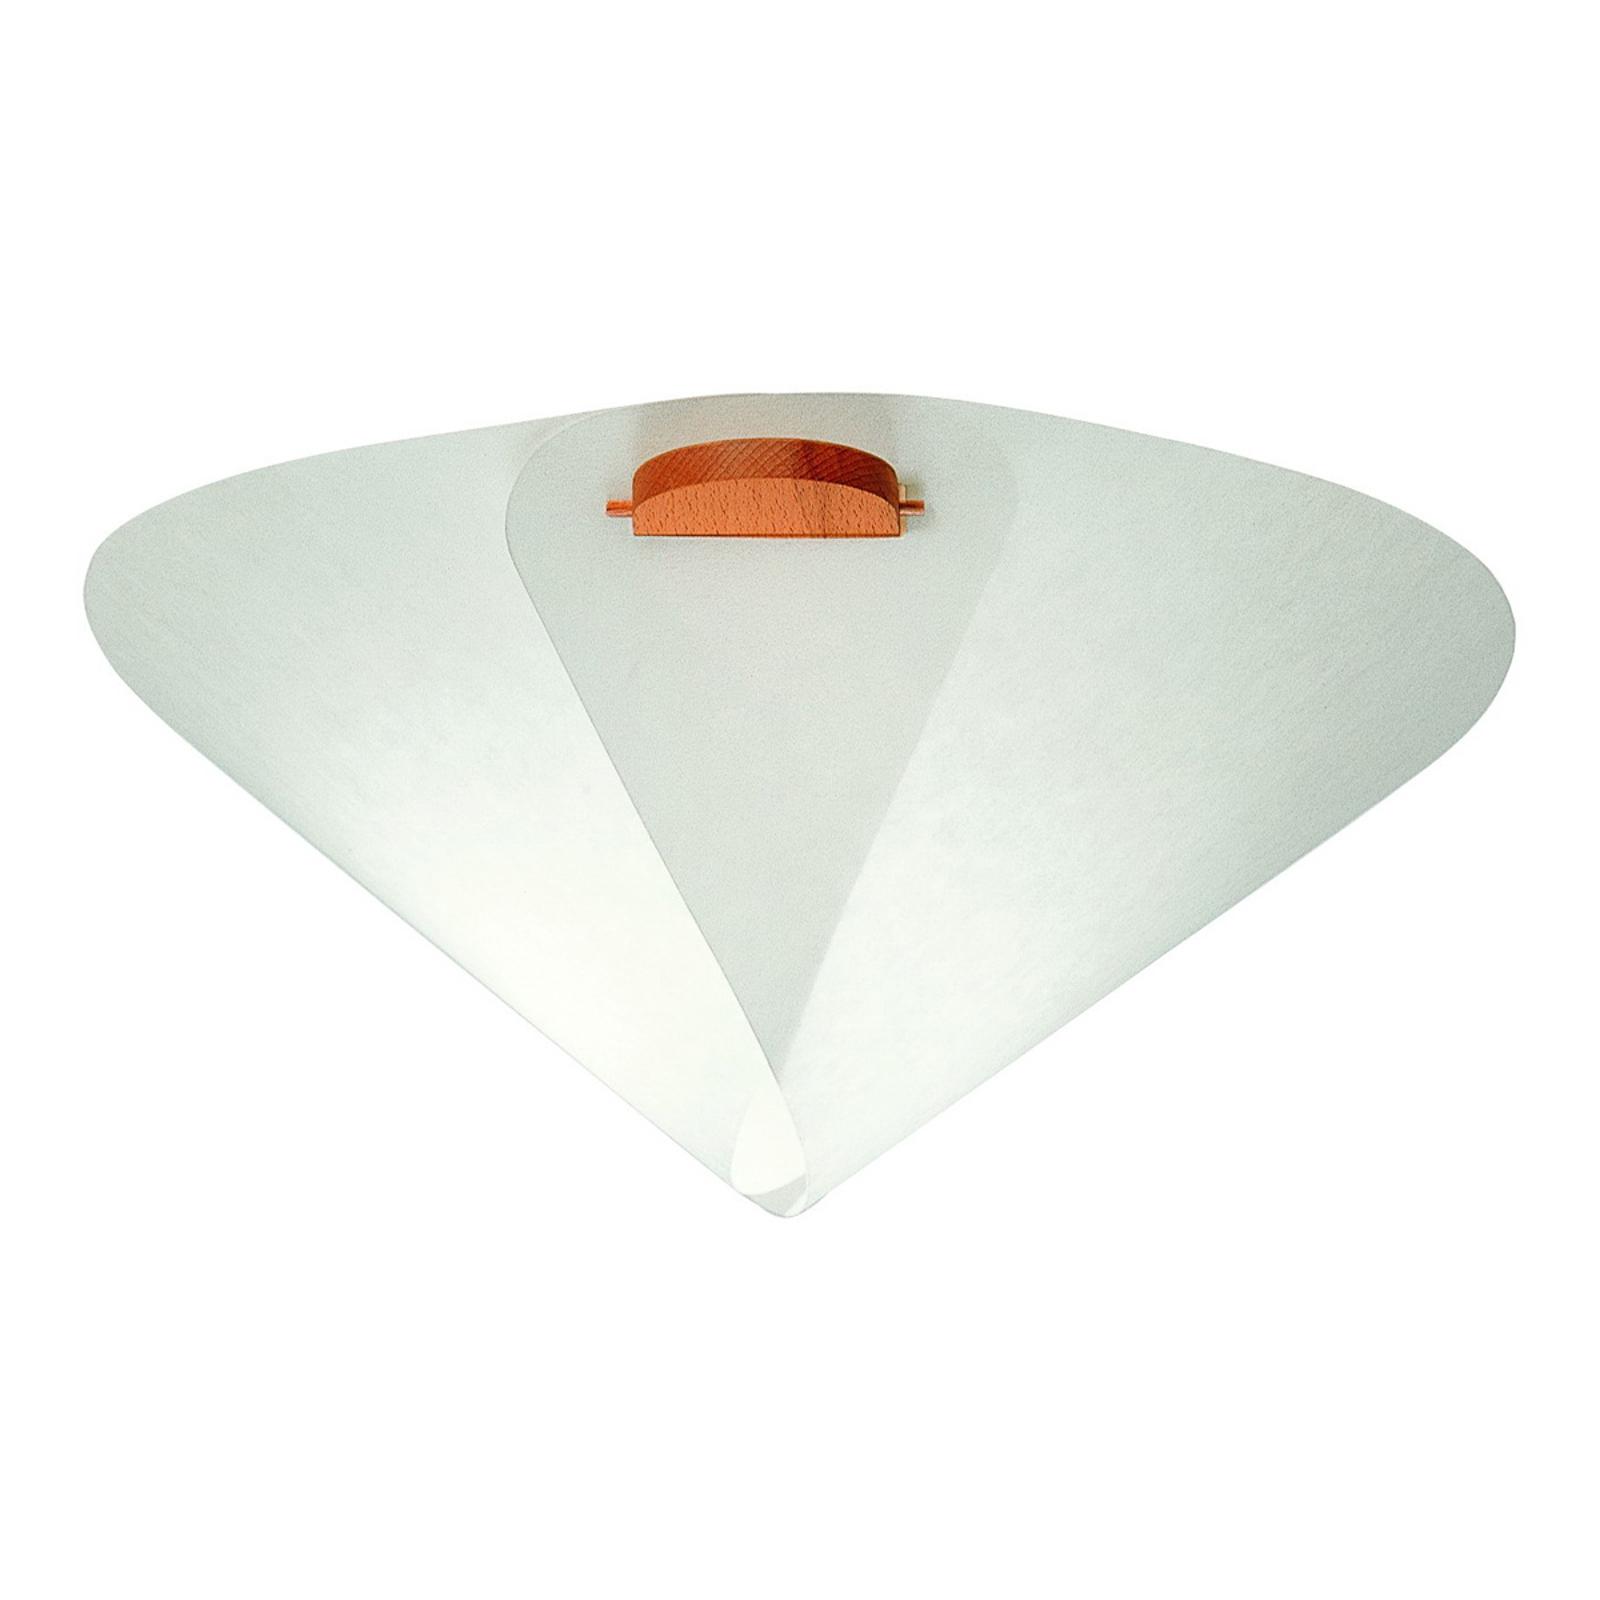 Design plafondlamp IRIS